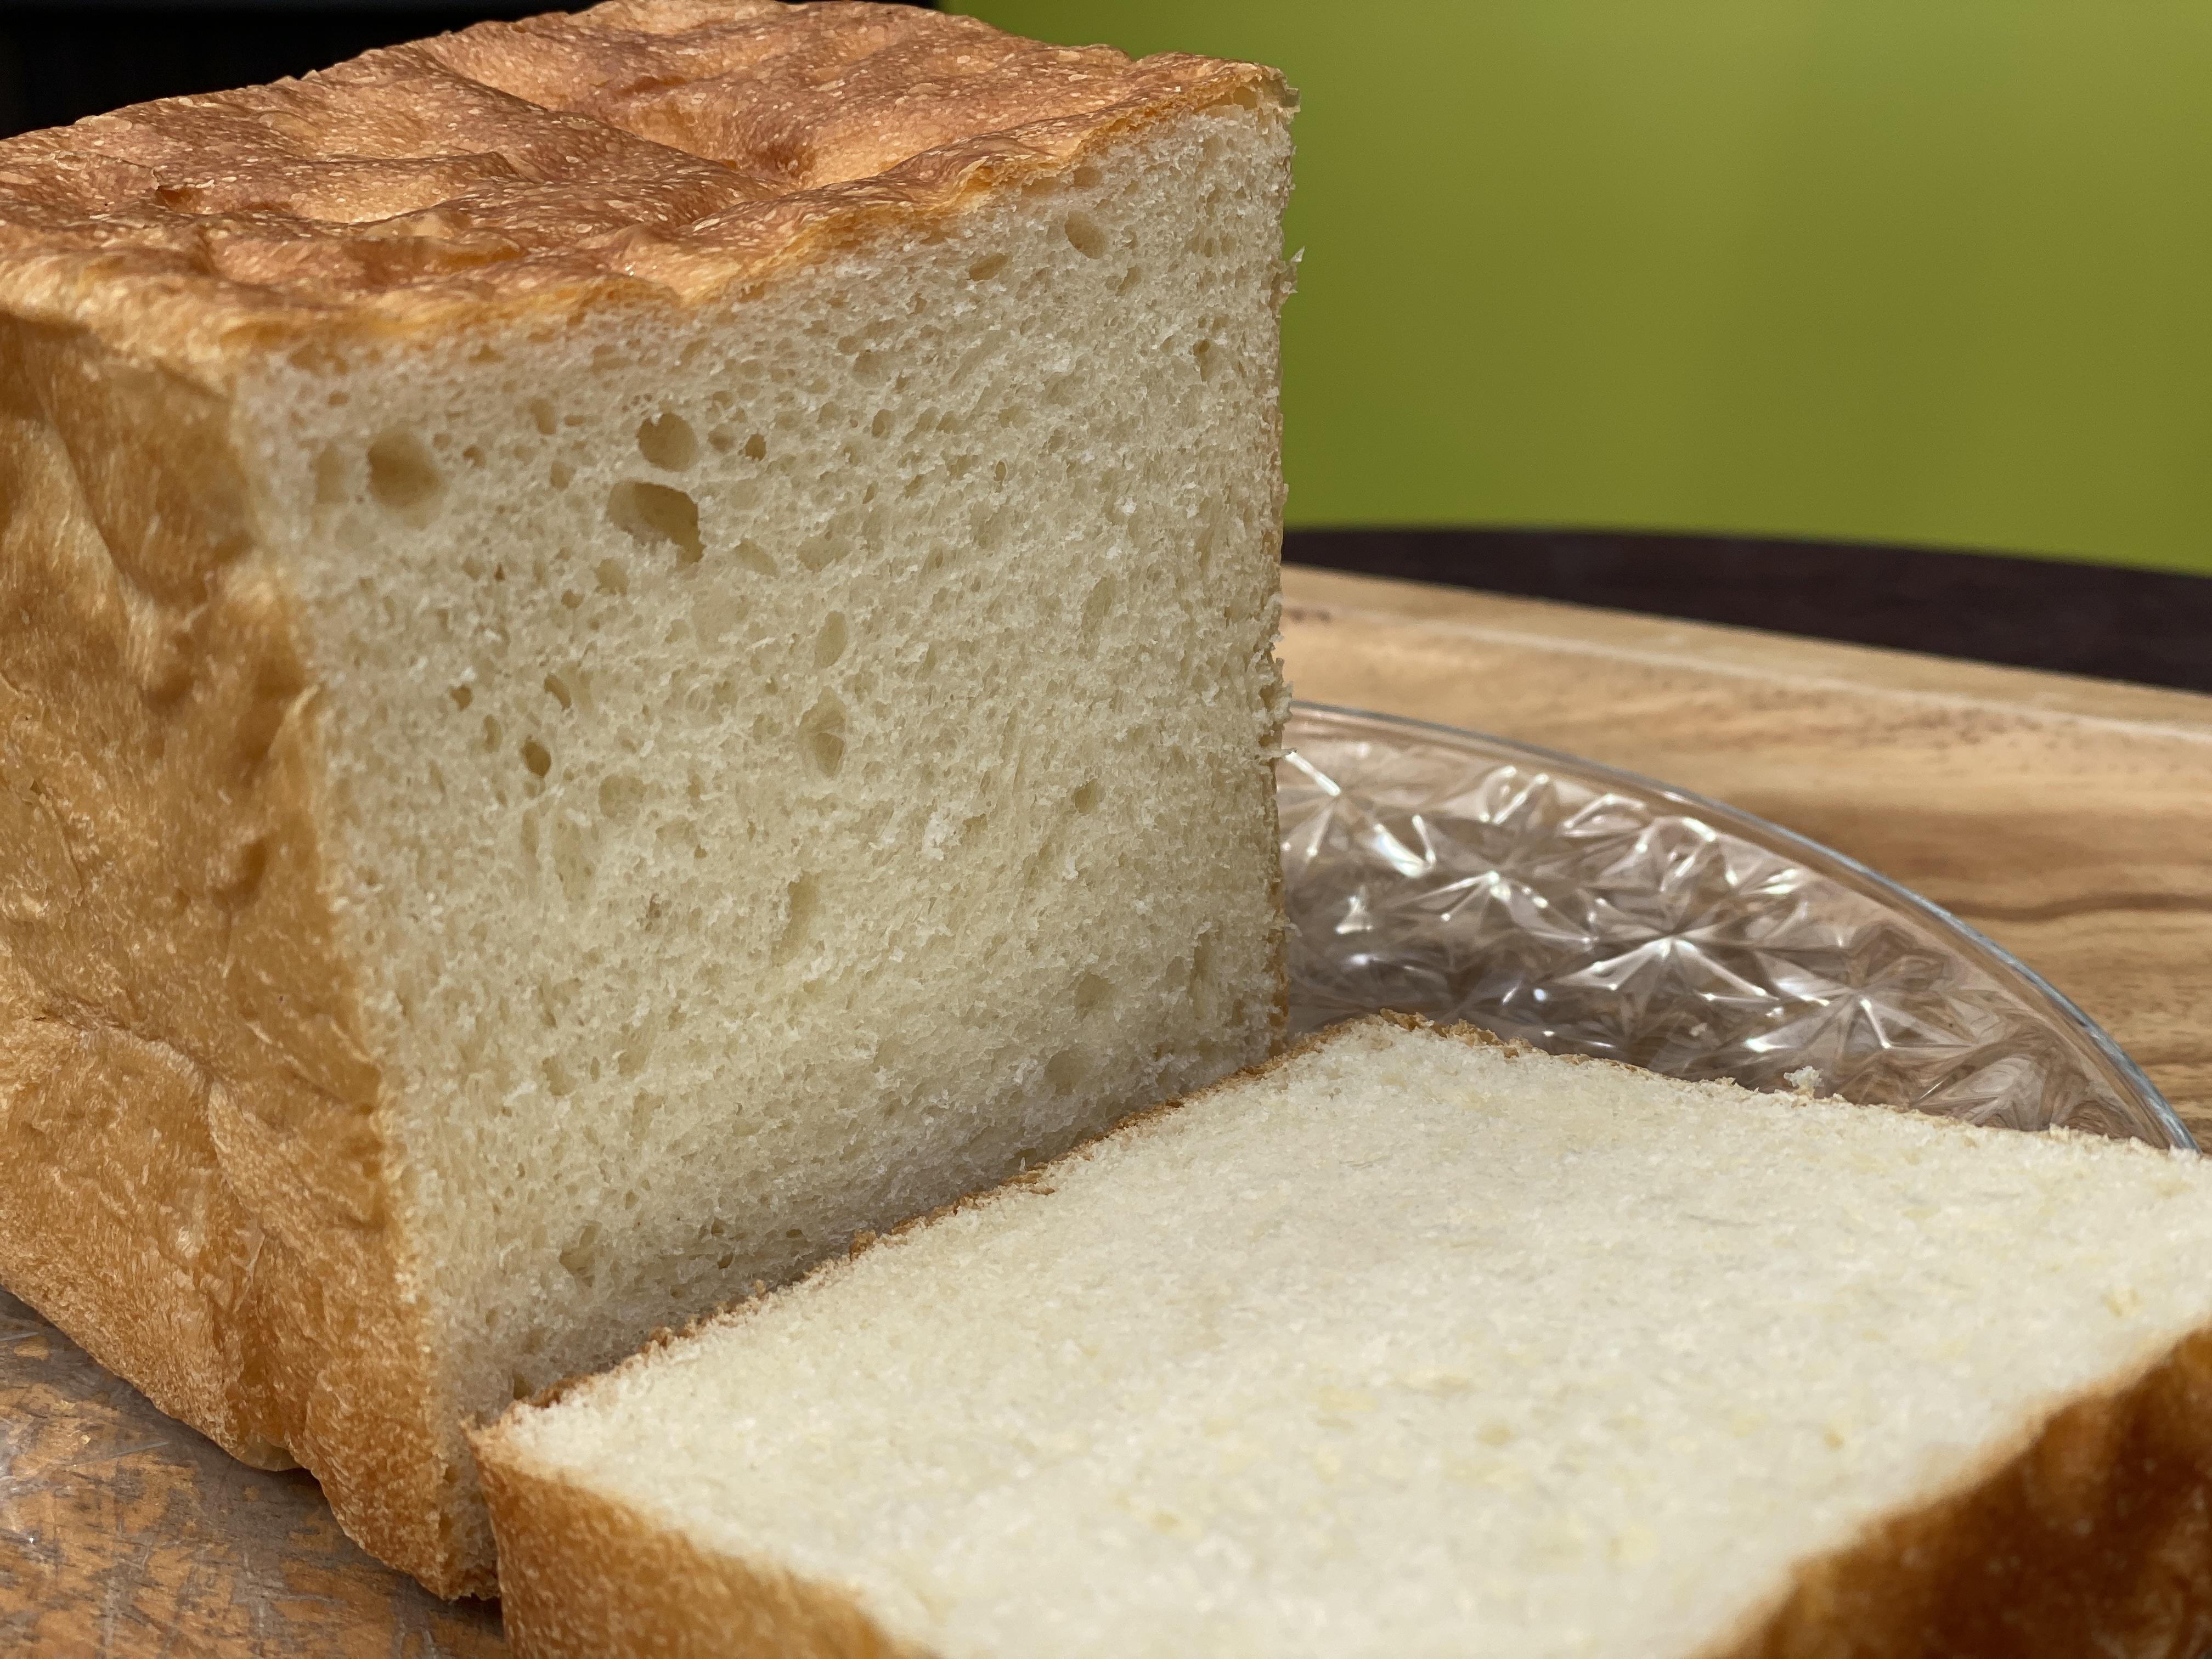 egggのデニッシュ食パン2個